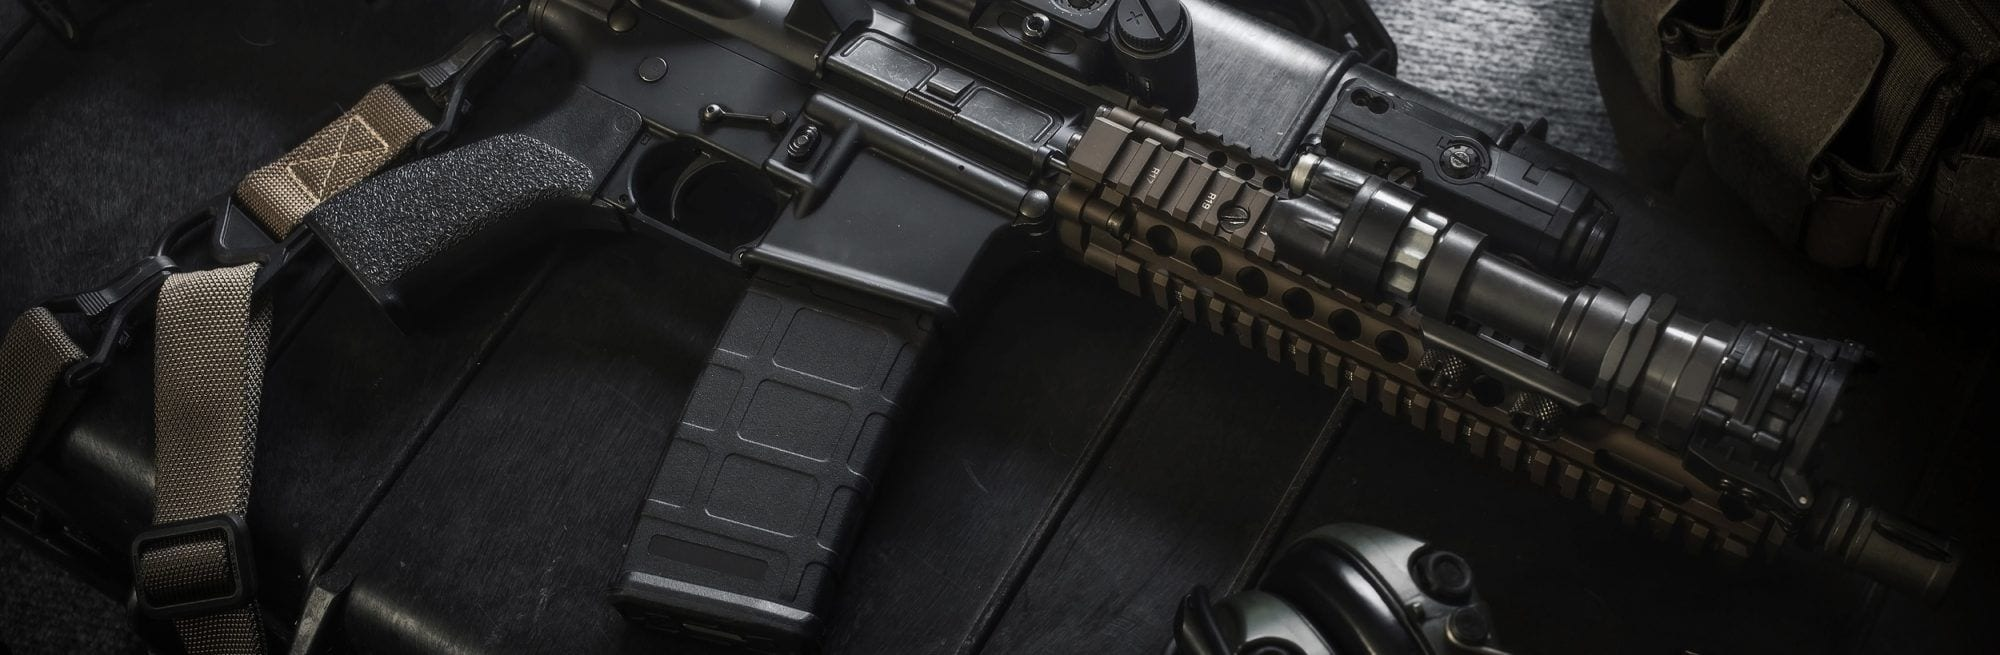 Leading Gun Resource